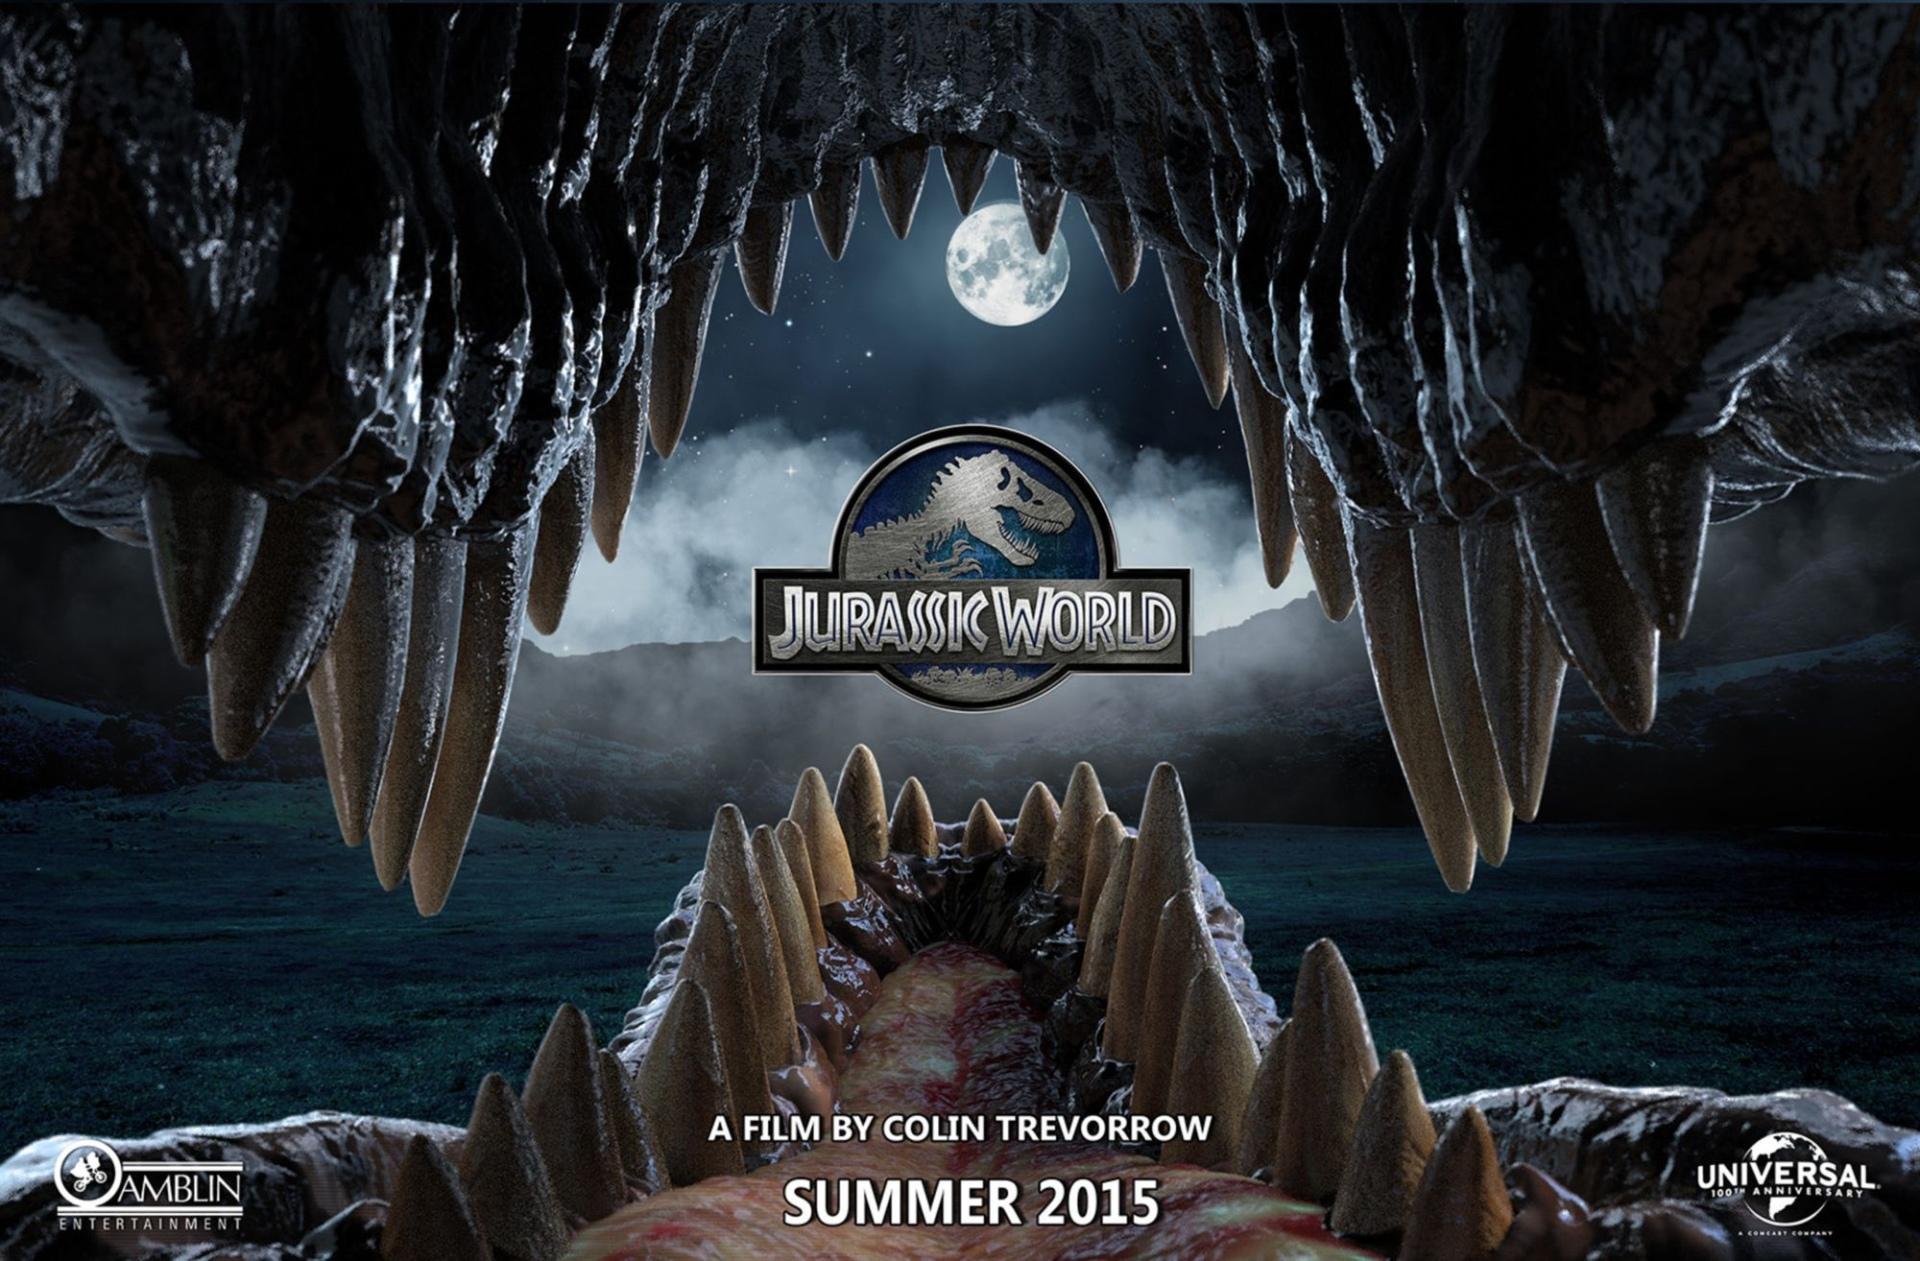 Fondos De Pantalla De Jurassic World Wallpapers Hd